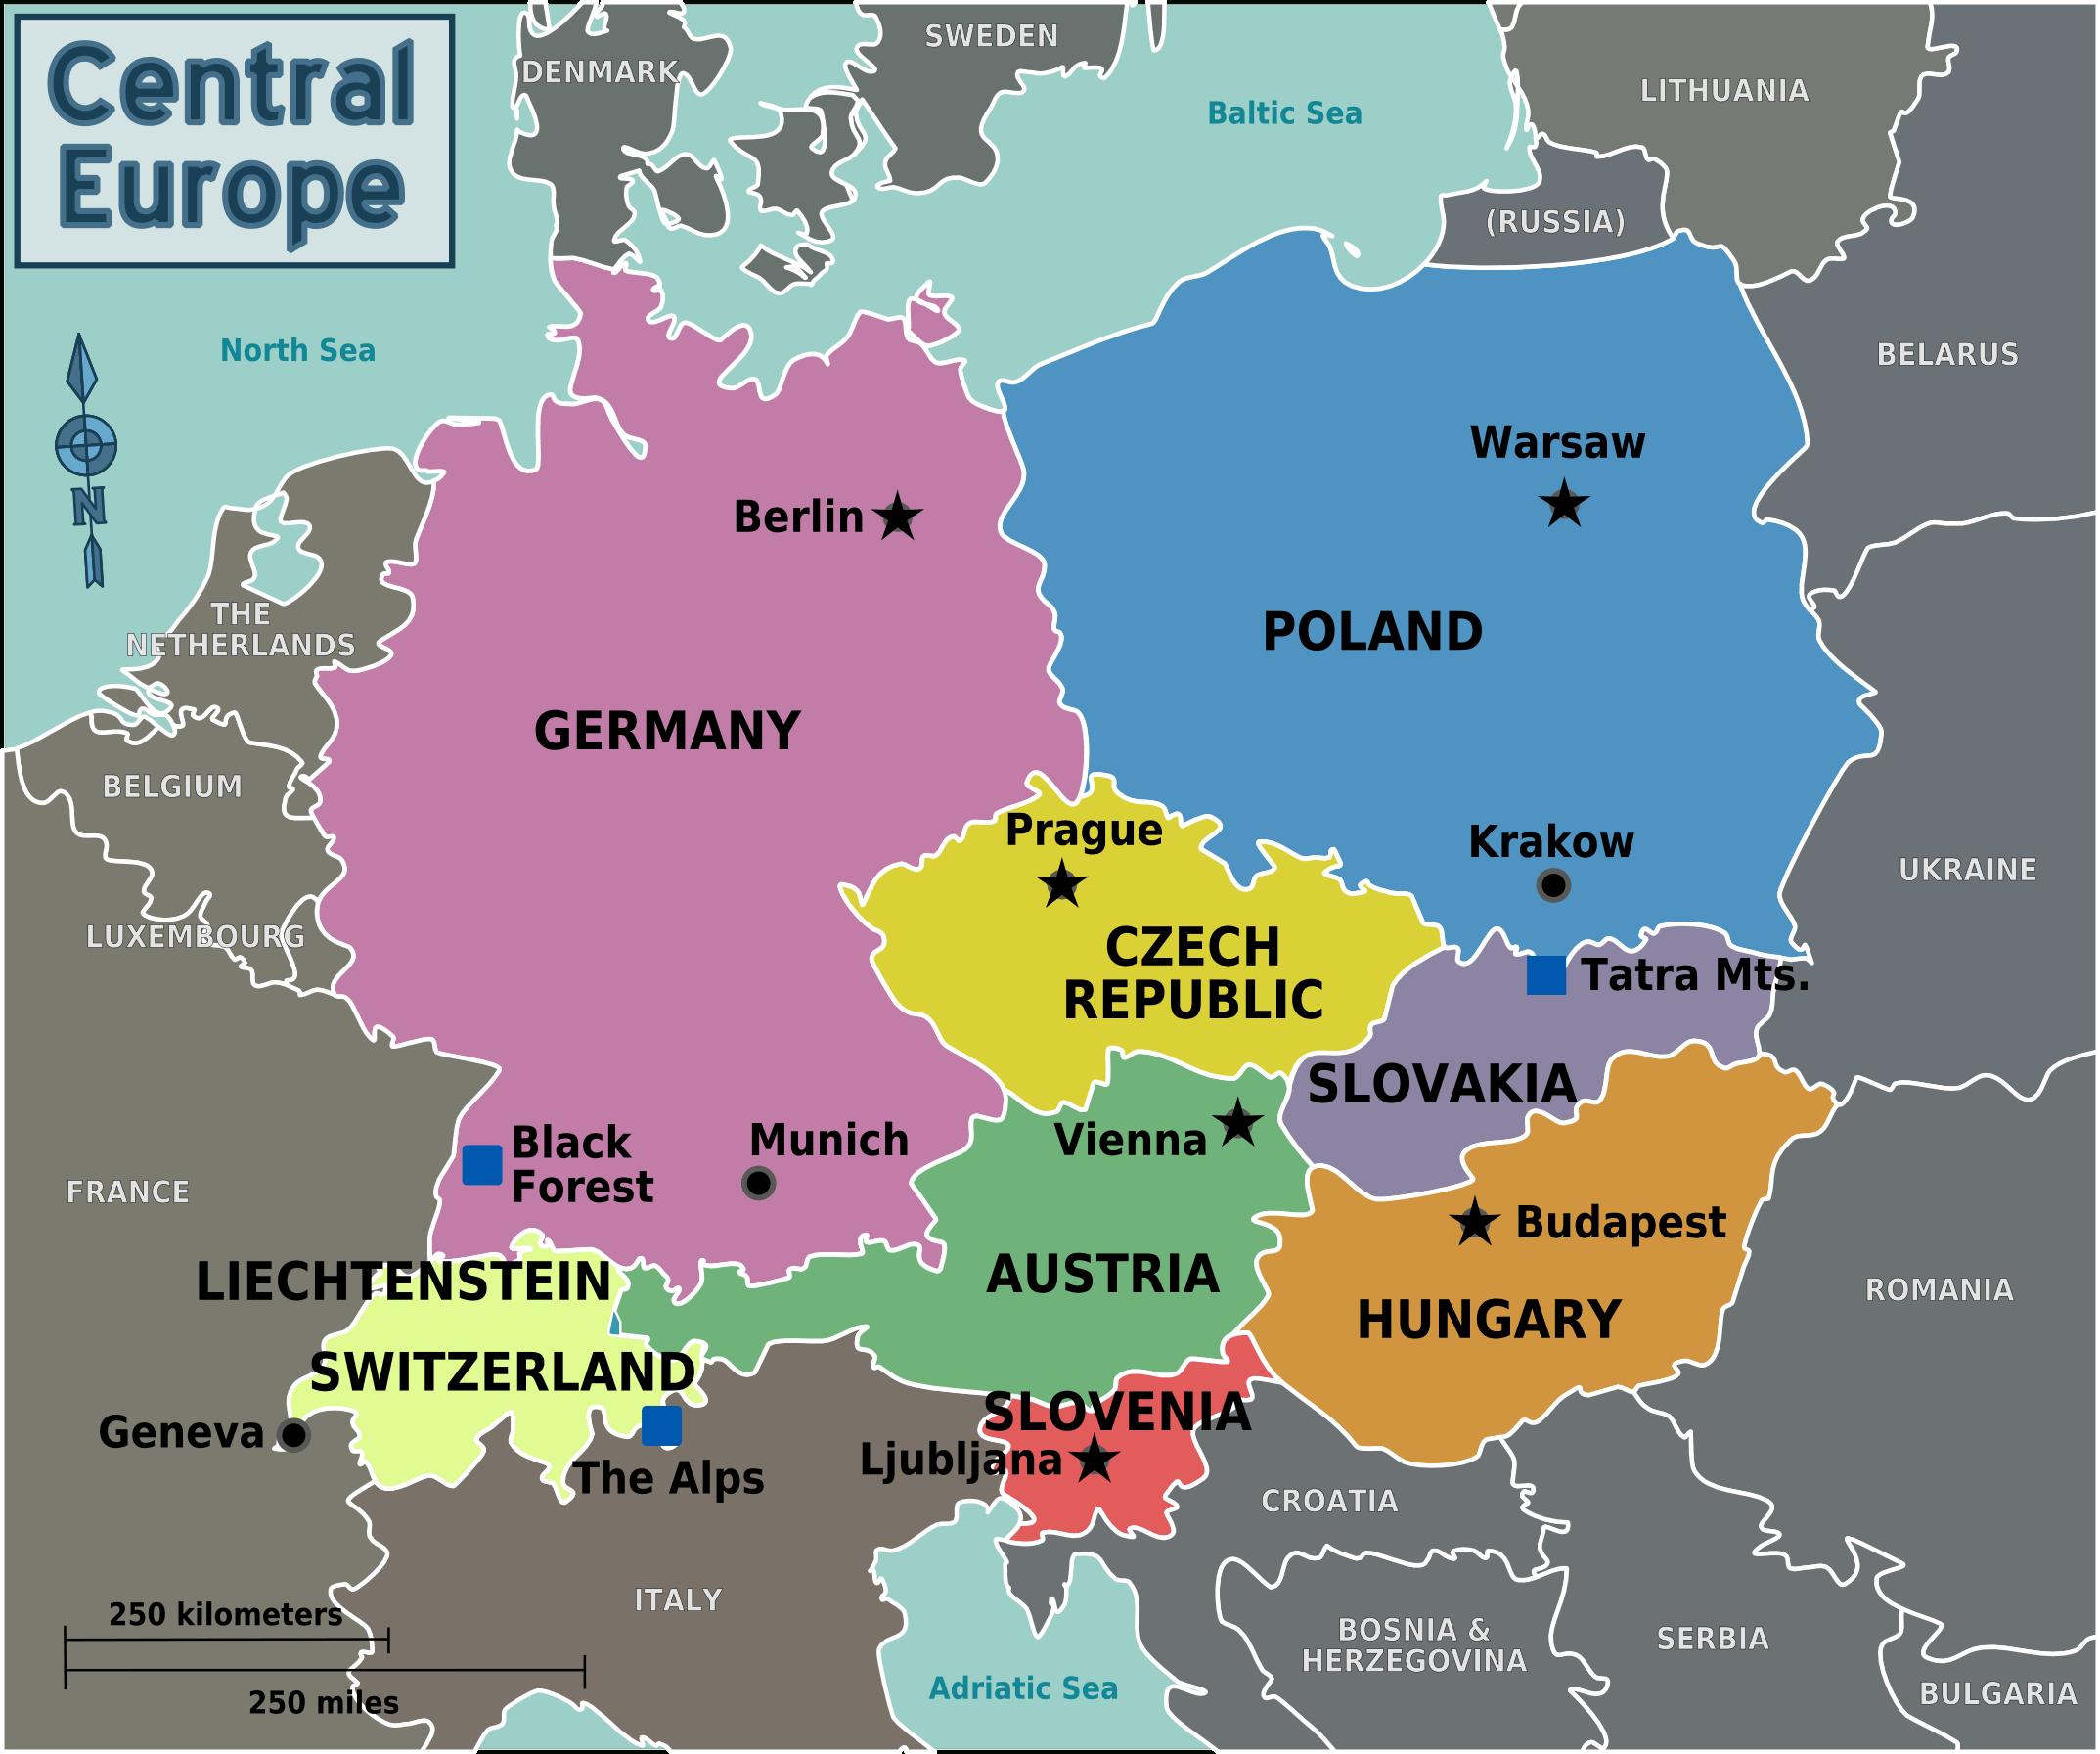 Map Of Central Europe With Capitals For Each Country intérieur Carte Europe De L Est